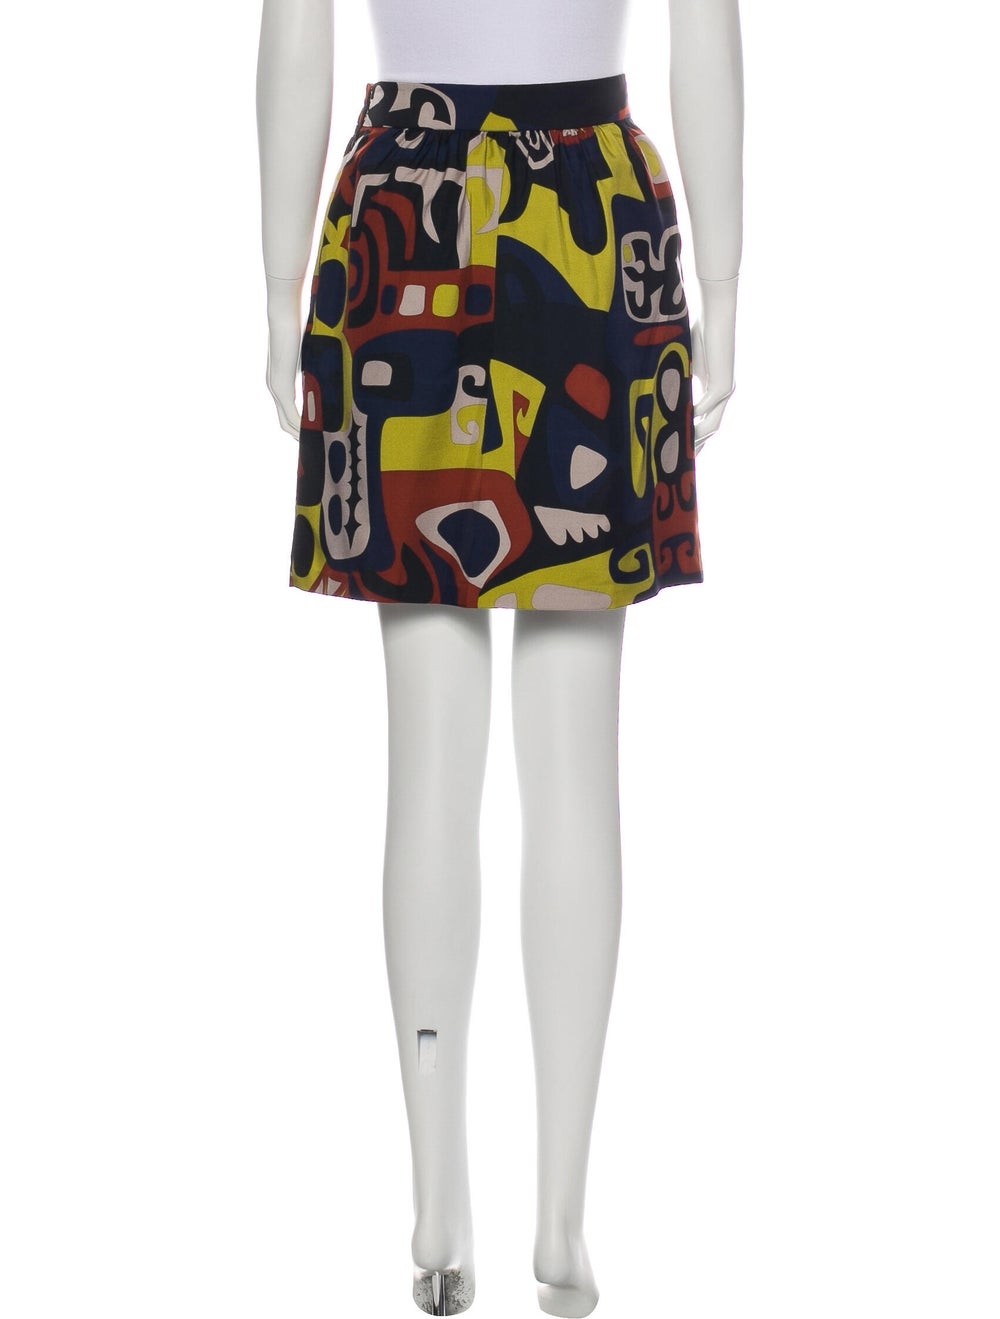 Tibi Silk Mini Skirt - image 3